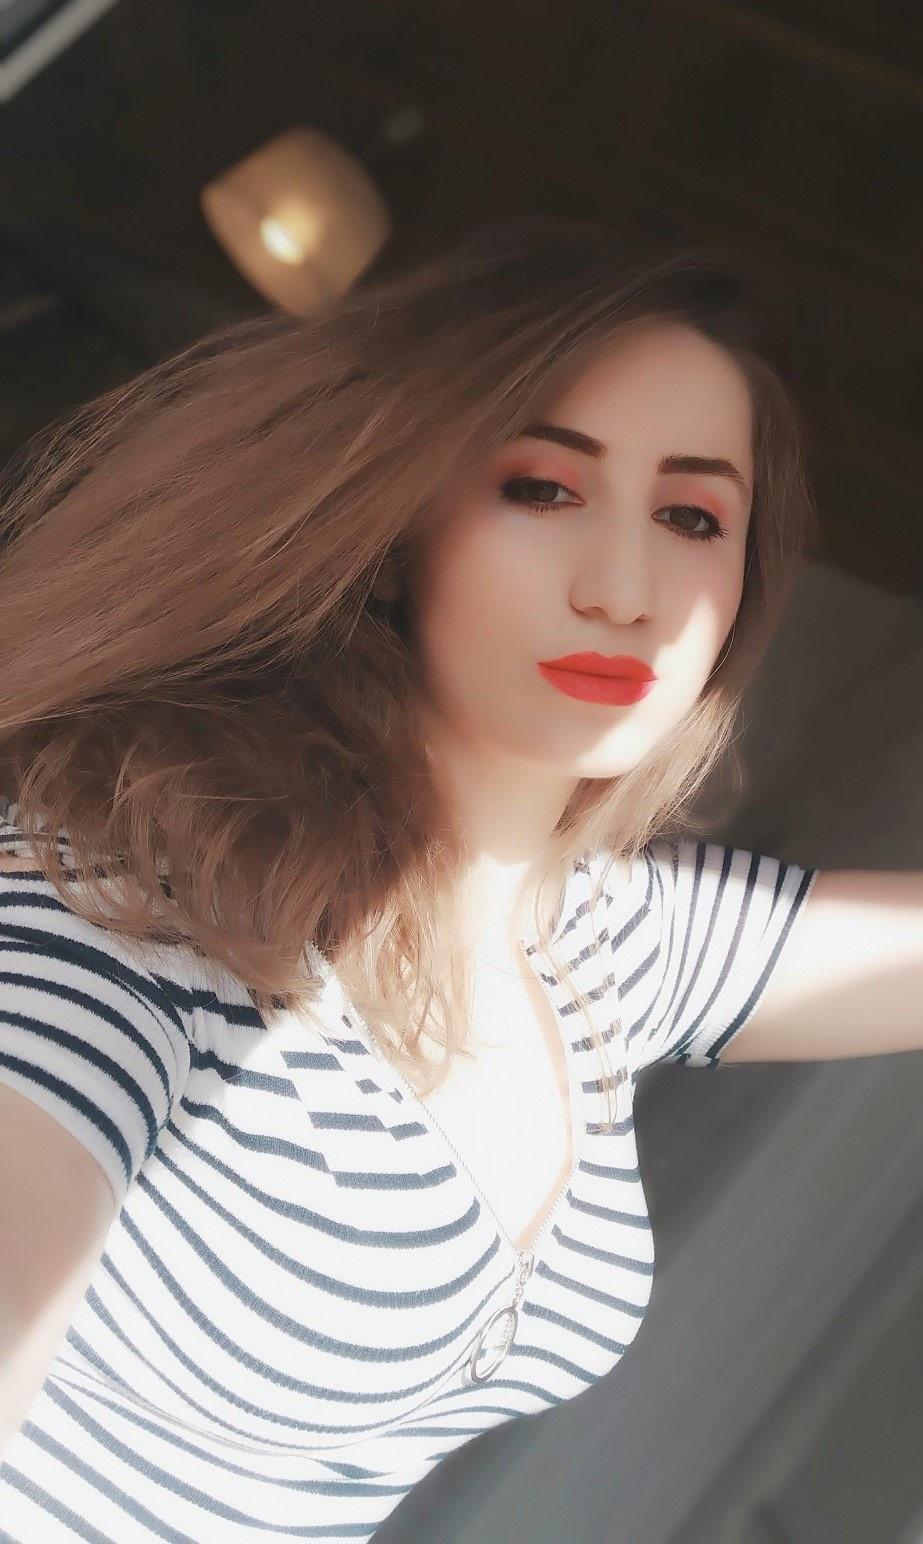 lorena-stroka-biografia-instagram-facebook-wikipedia-foto-burri-kontakt-kush-eshte-gazetare-albstroka-age